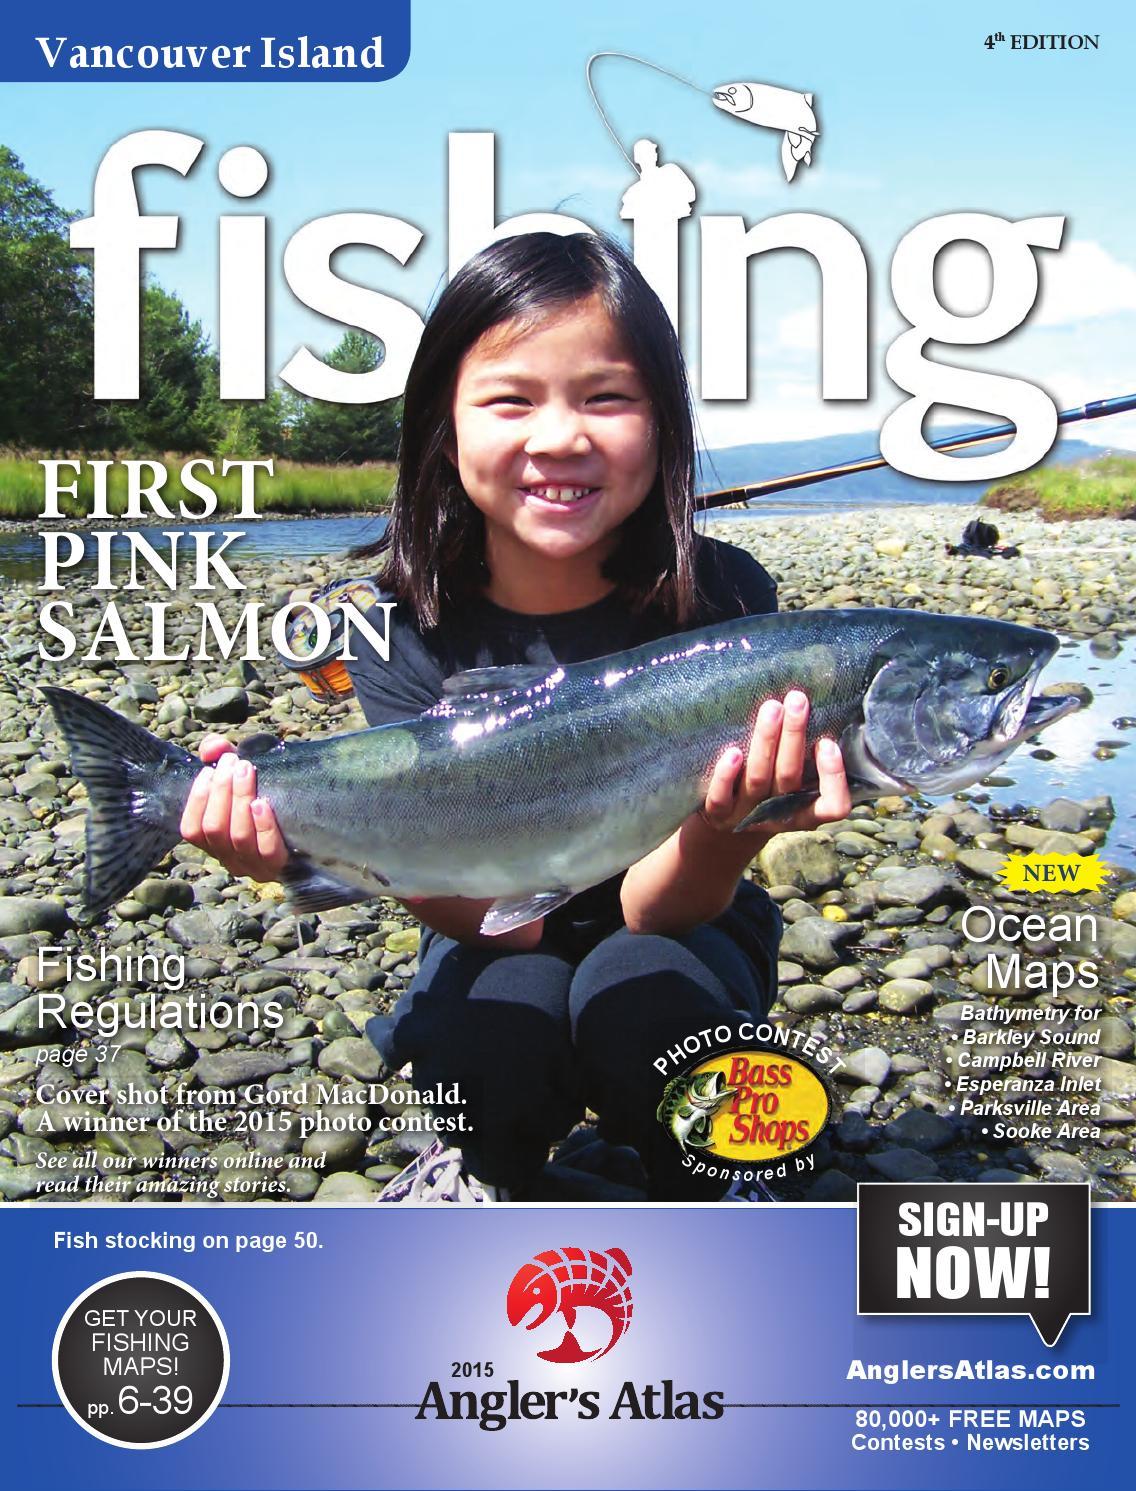 Bc vancouver island fishing 2015 by angler 39 s atlas issuu for Vancouver island fishing